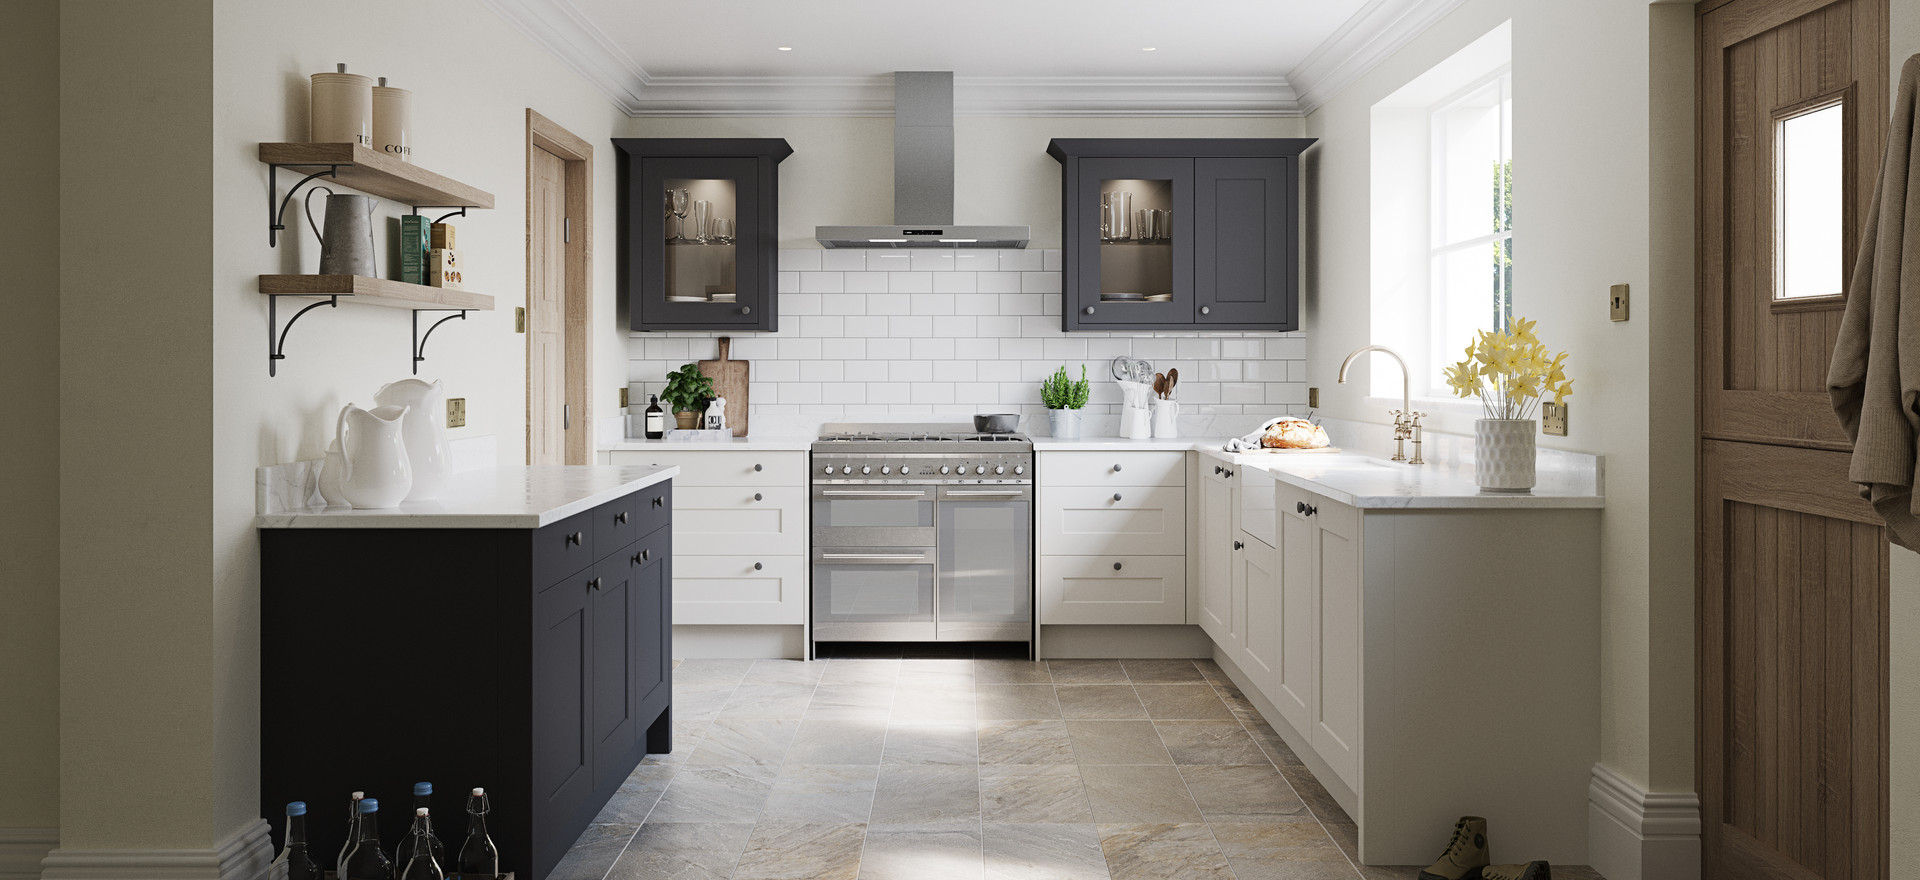 Belsay Dove Grey & Graphite